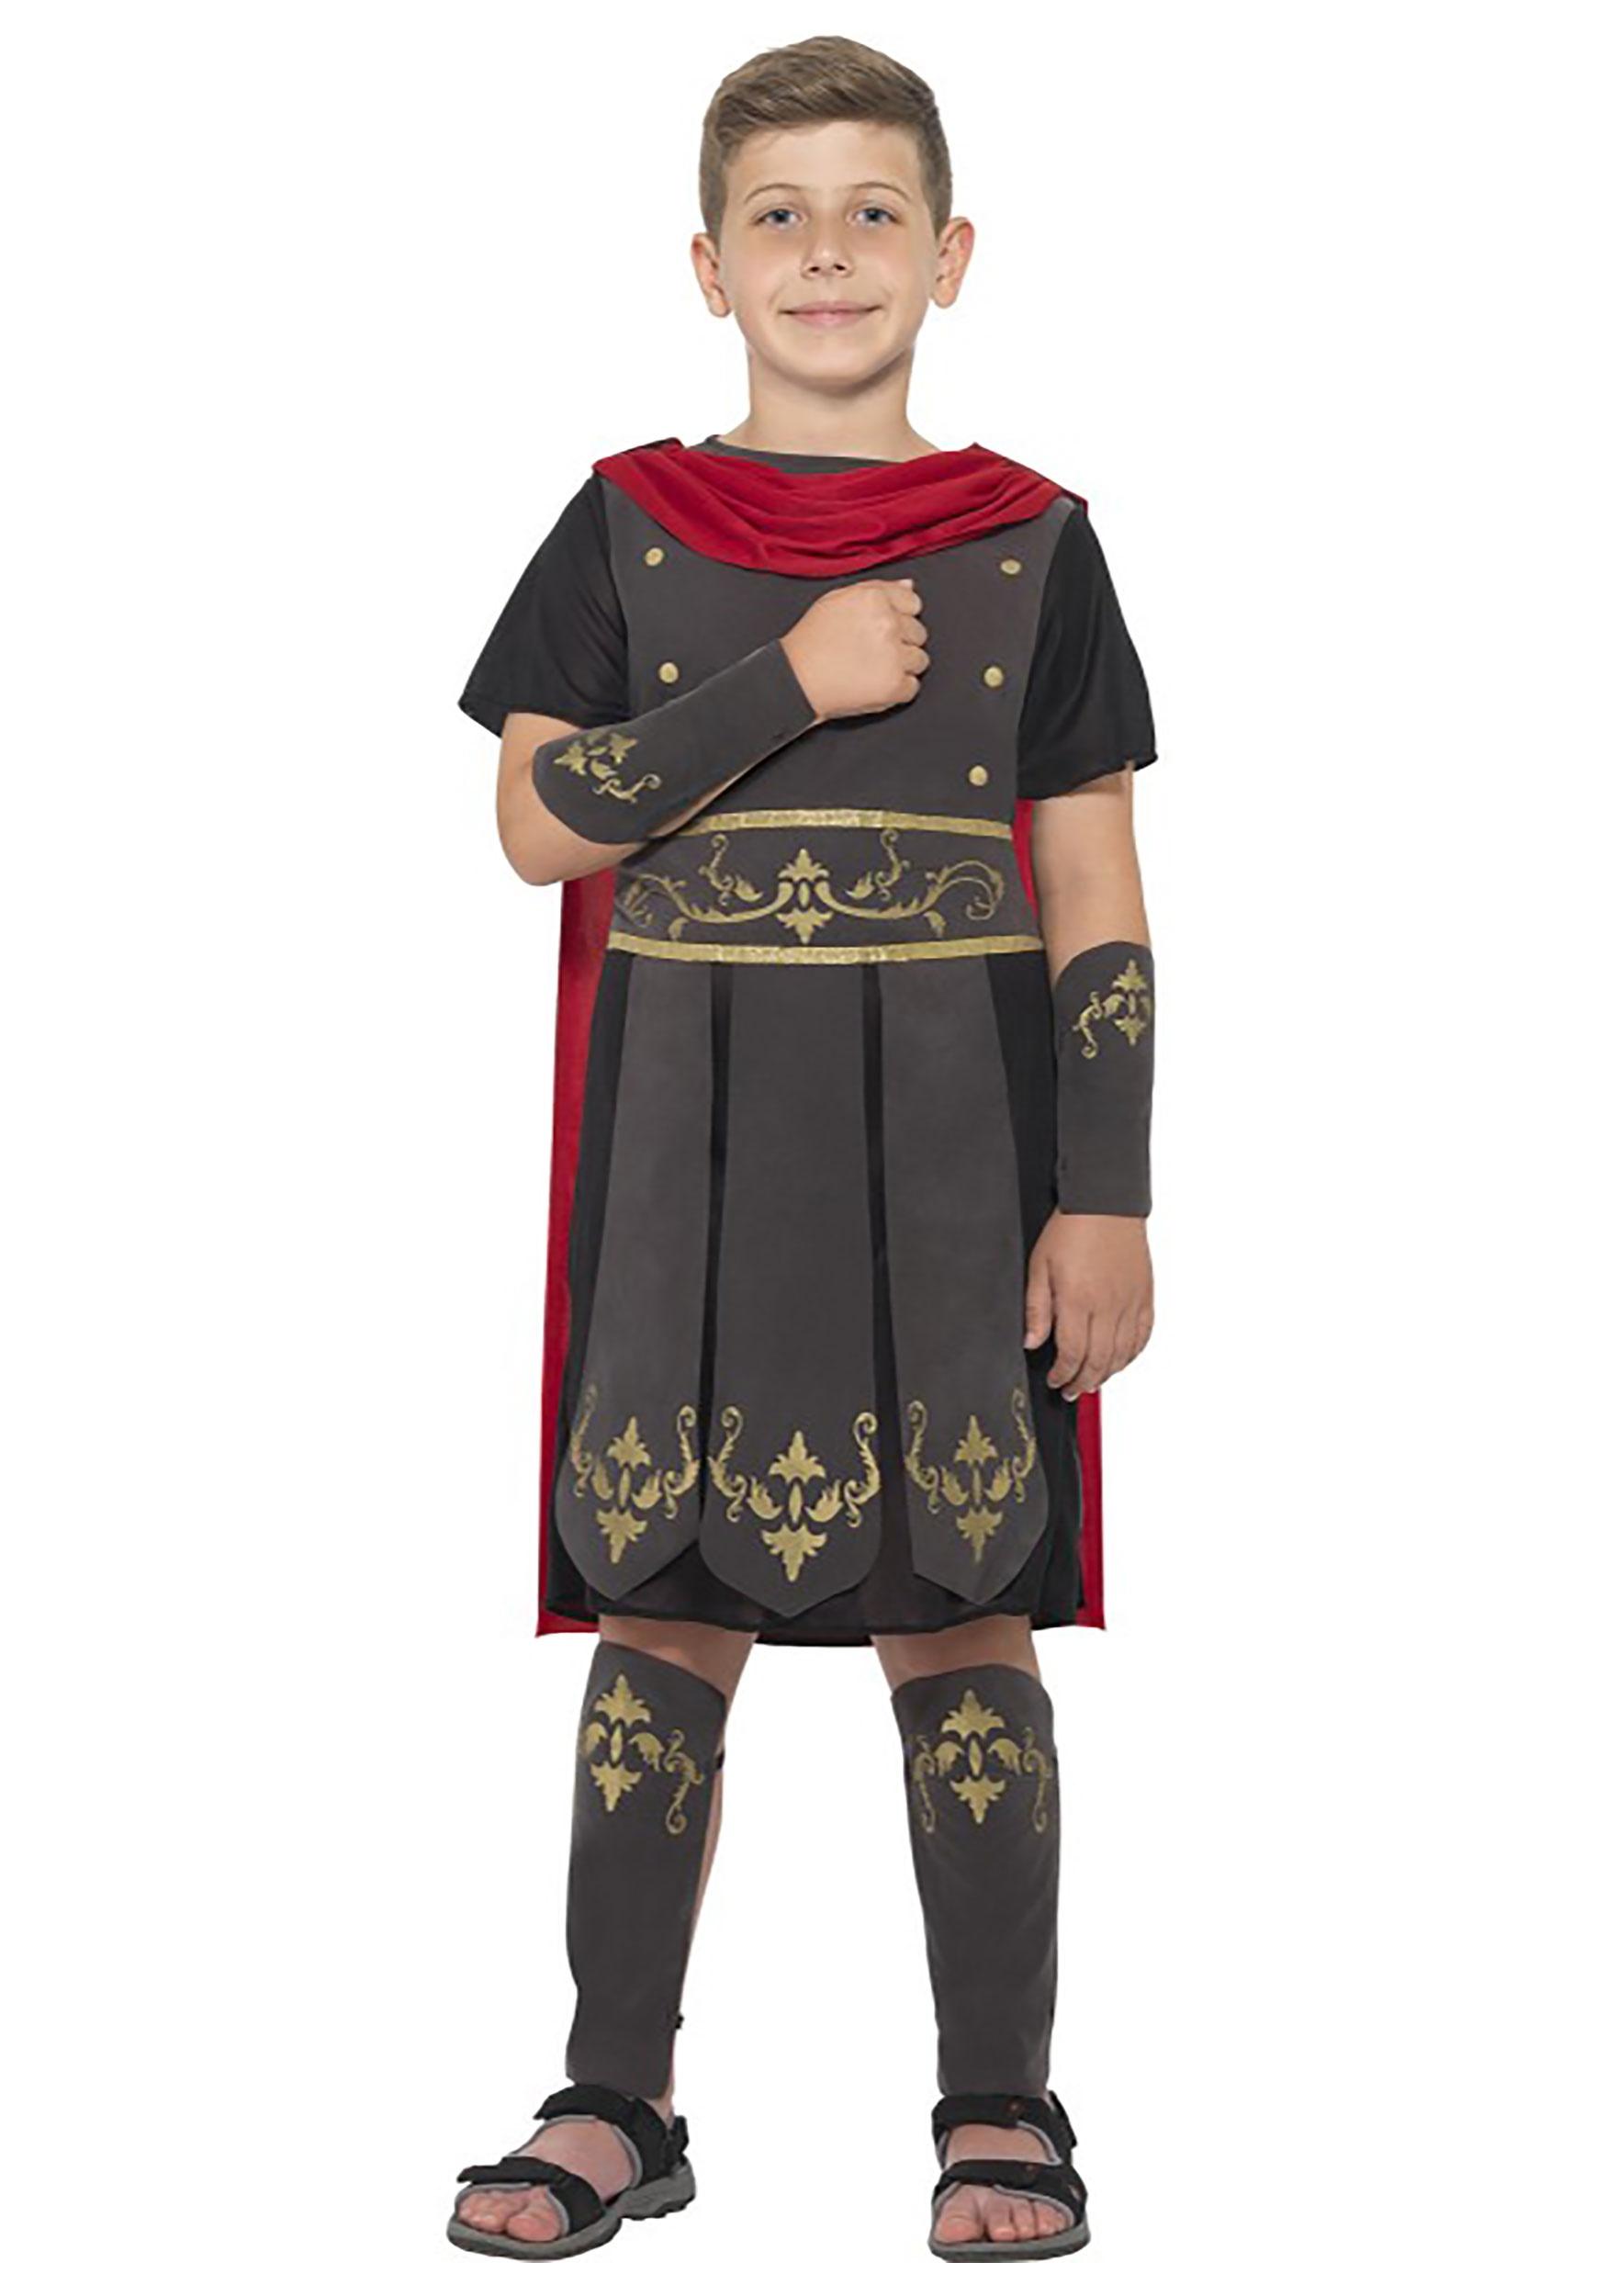 Boys Roman Soldier Costume  sc 1 st  Halloween Costumes UK & Roman Costumes - HalloweenCostumes.com